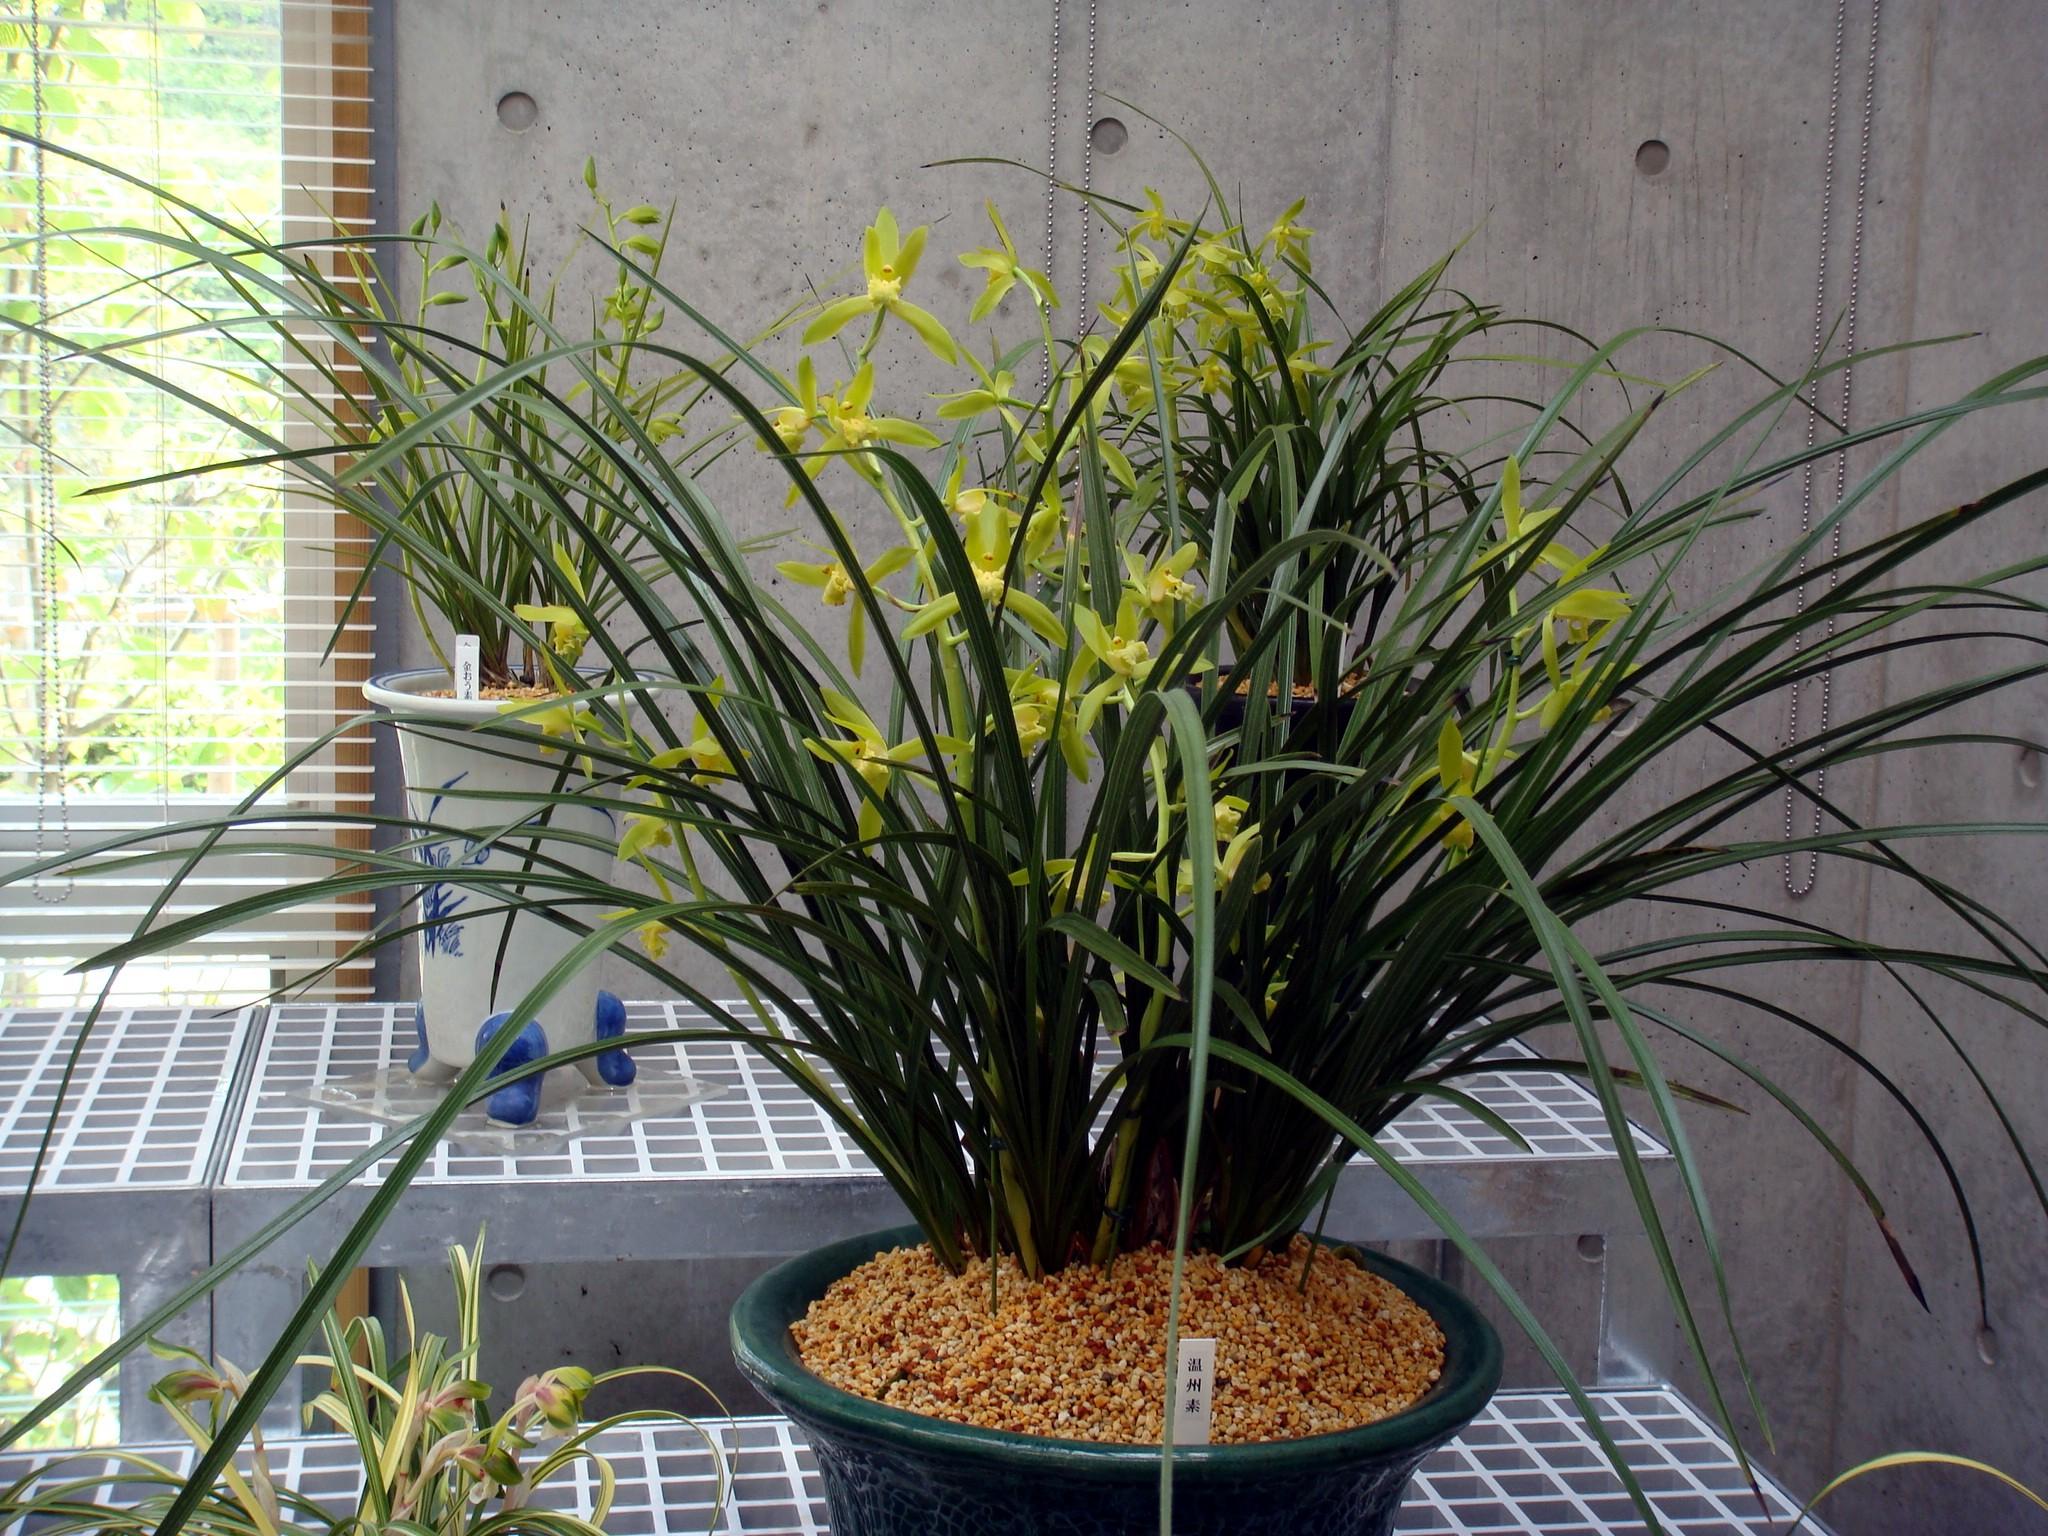 http://orchids.la.coocan.jp/Cymbidium/Cymbidium%20faberi/DSC02982.JPG